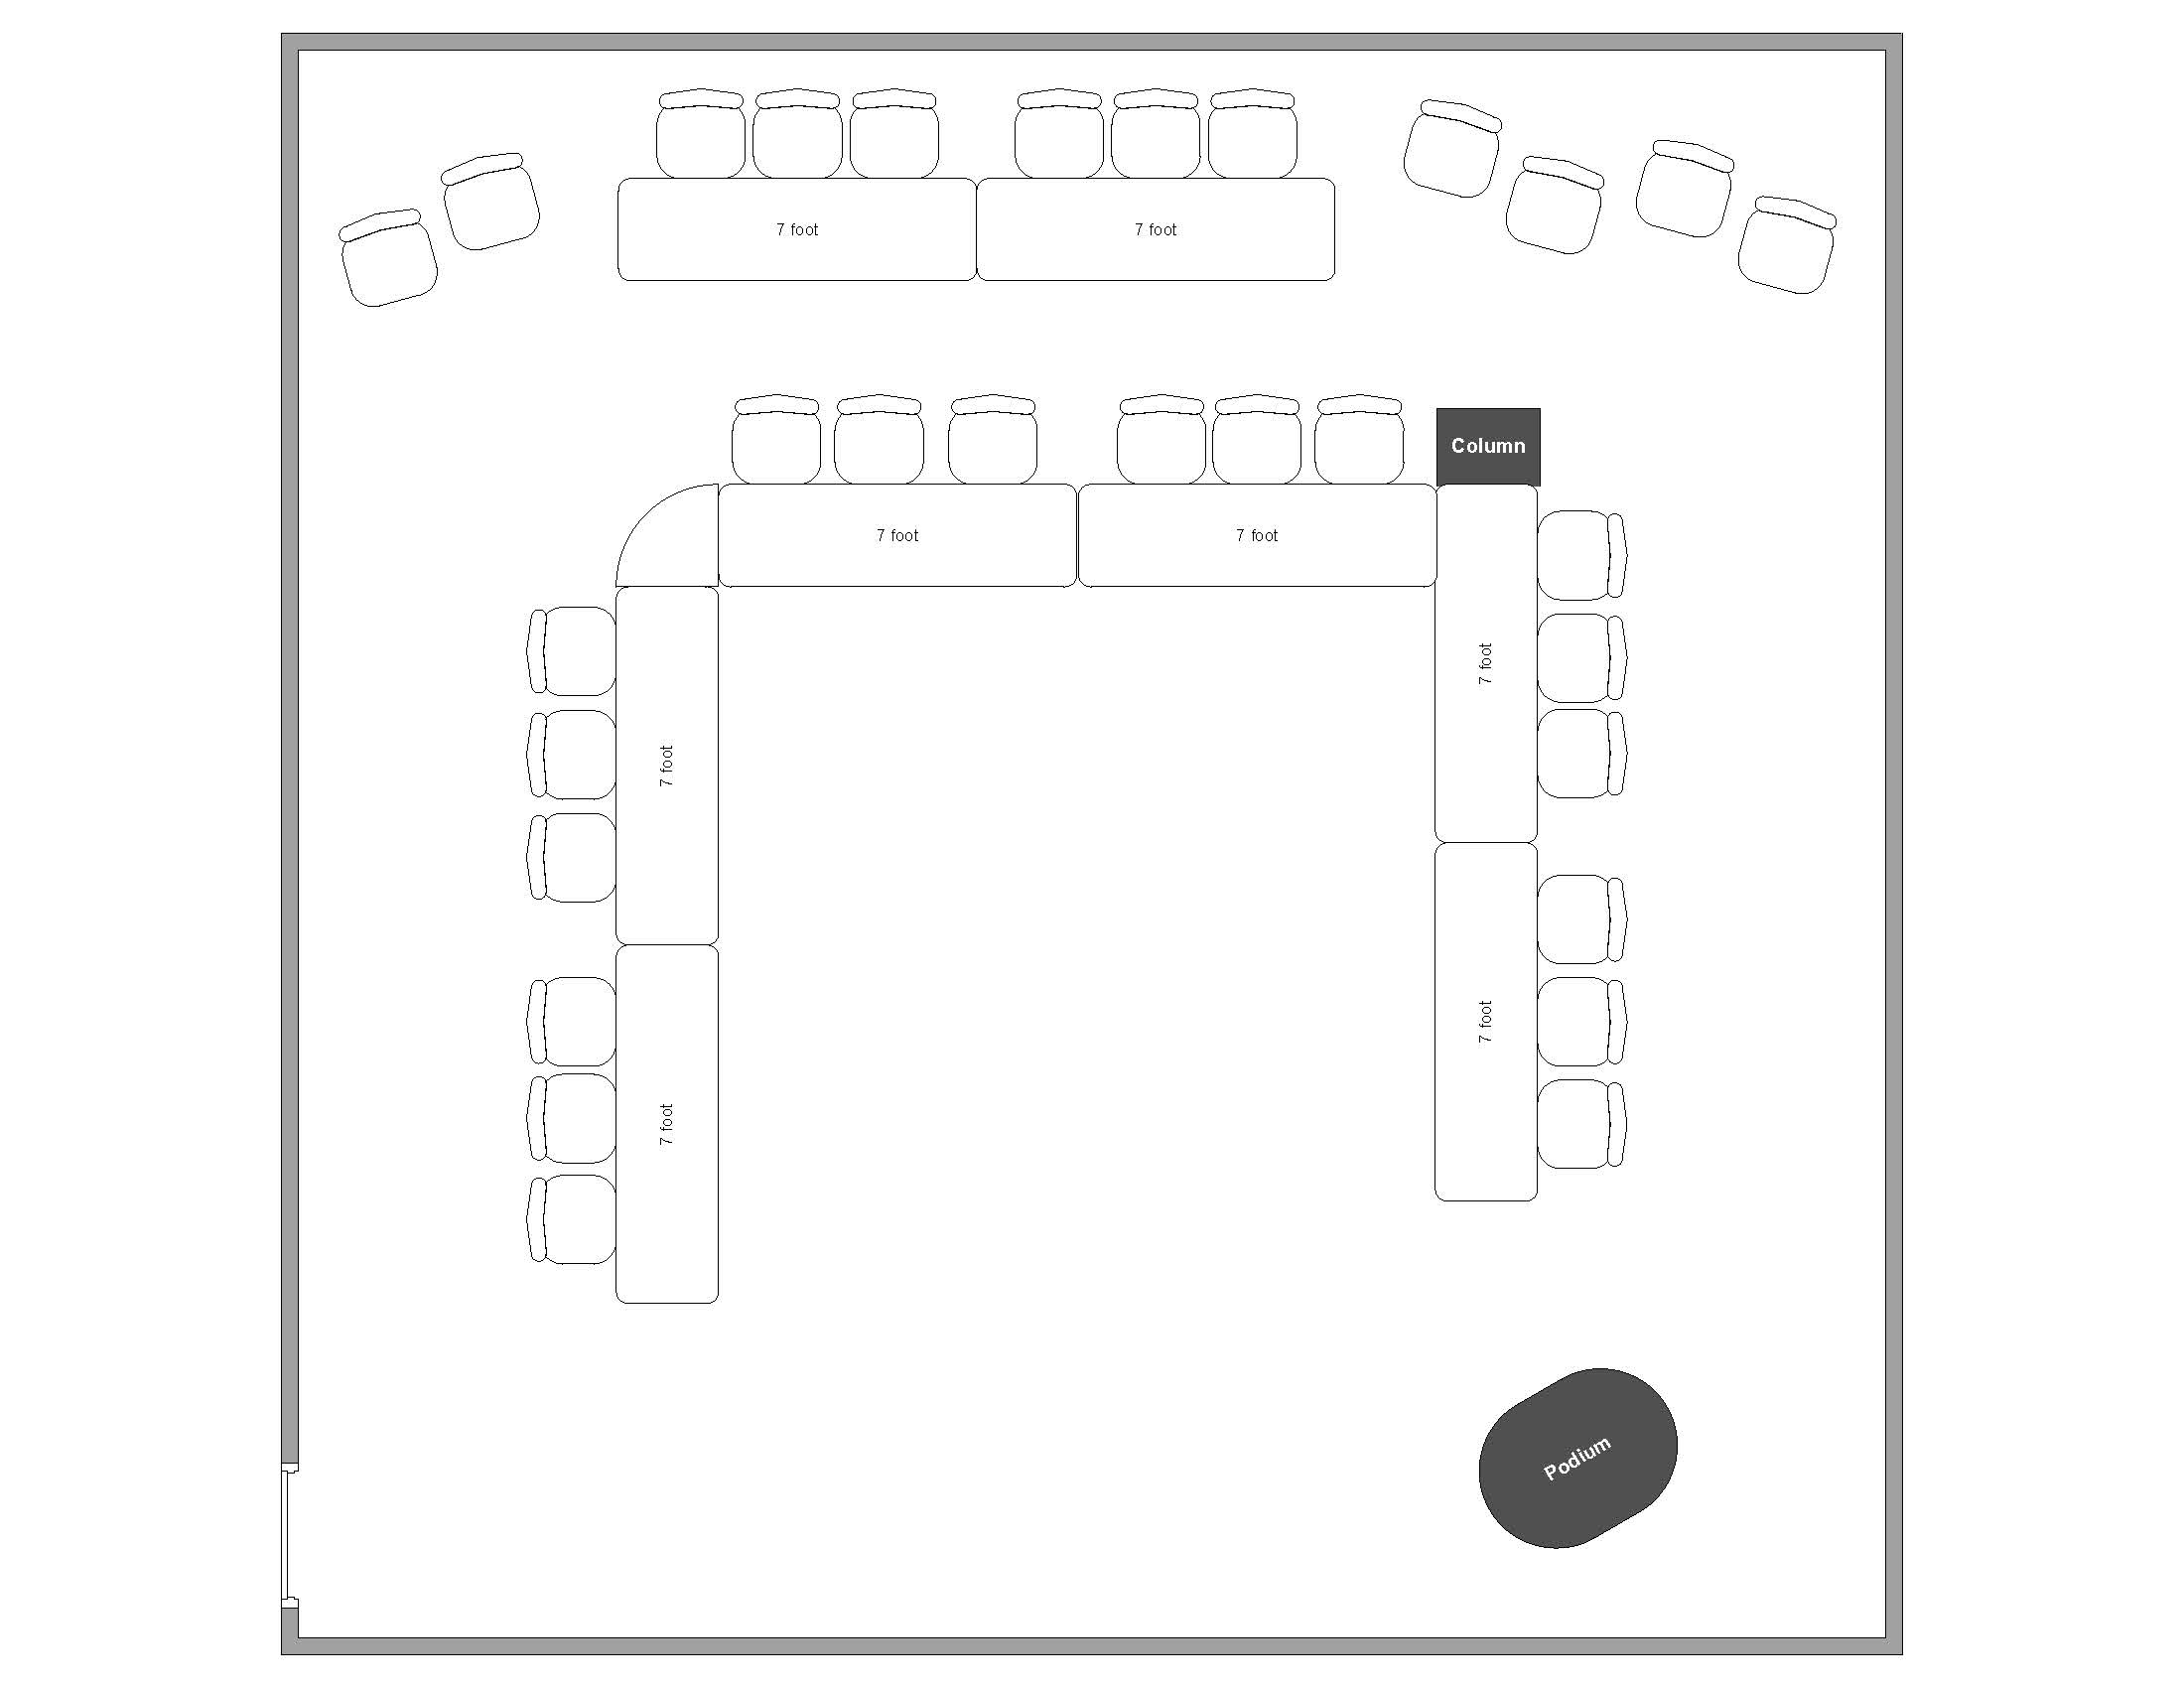 Tuck Events Amp Facilities Alperin Diagrams